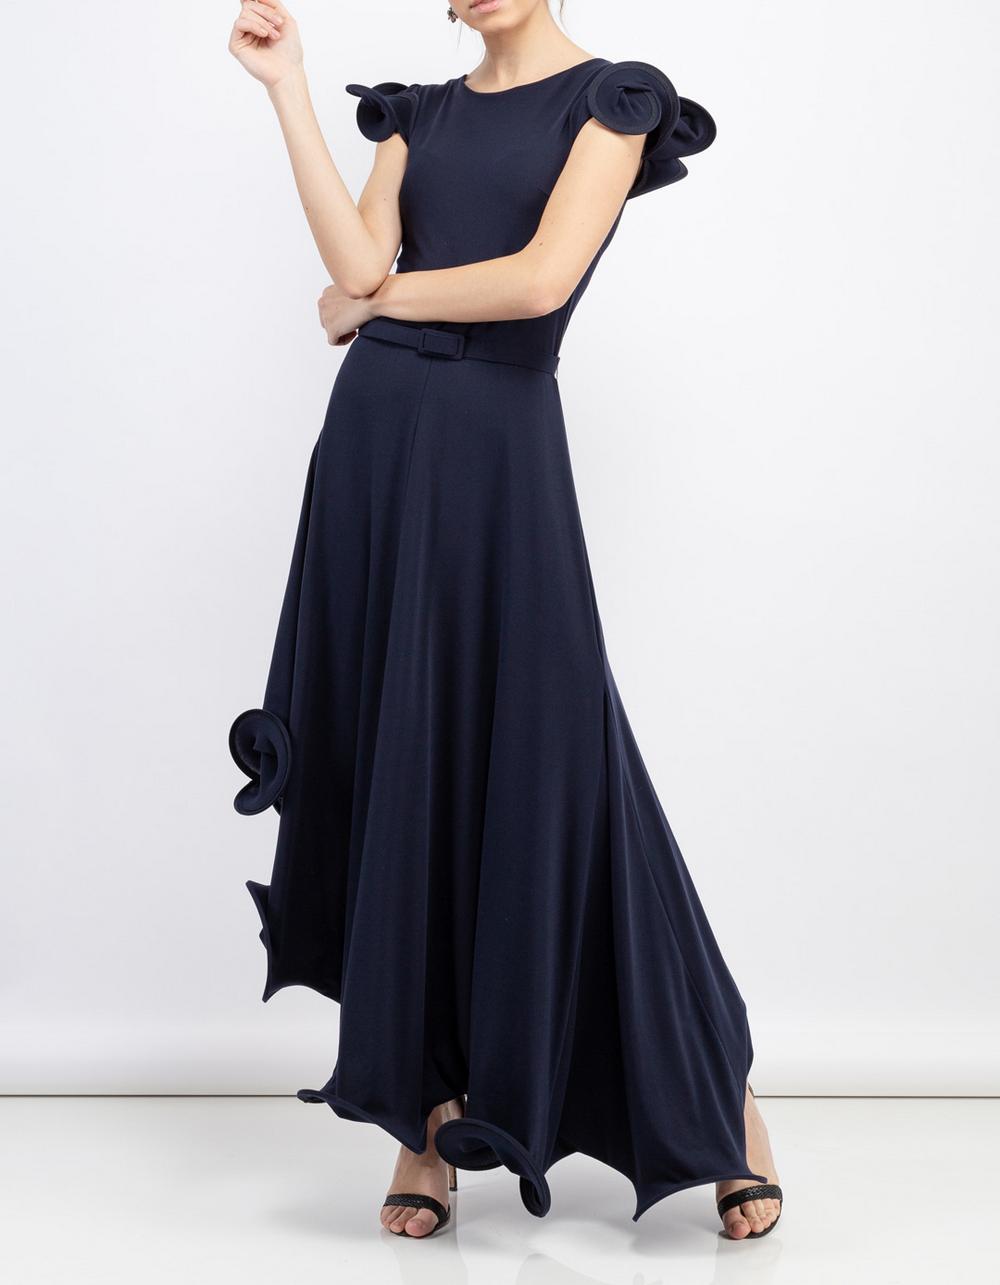 Laura Daili Wavy dress (10)